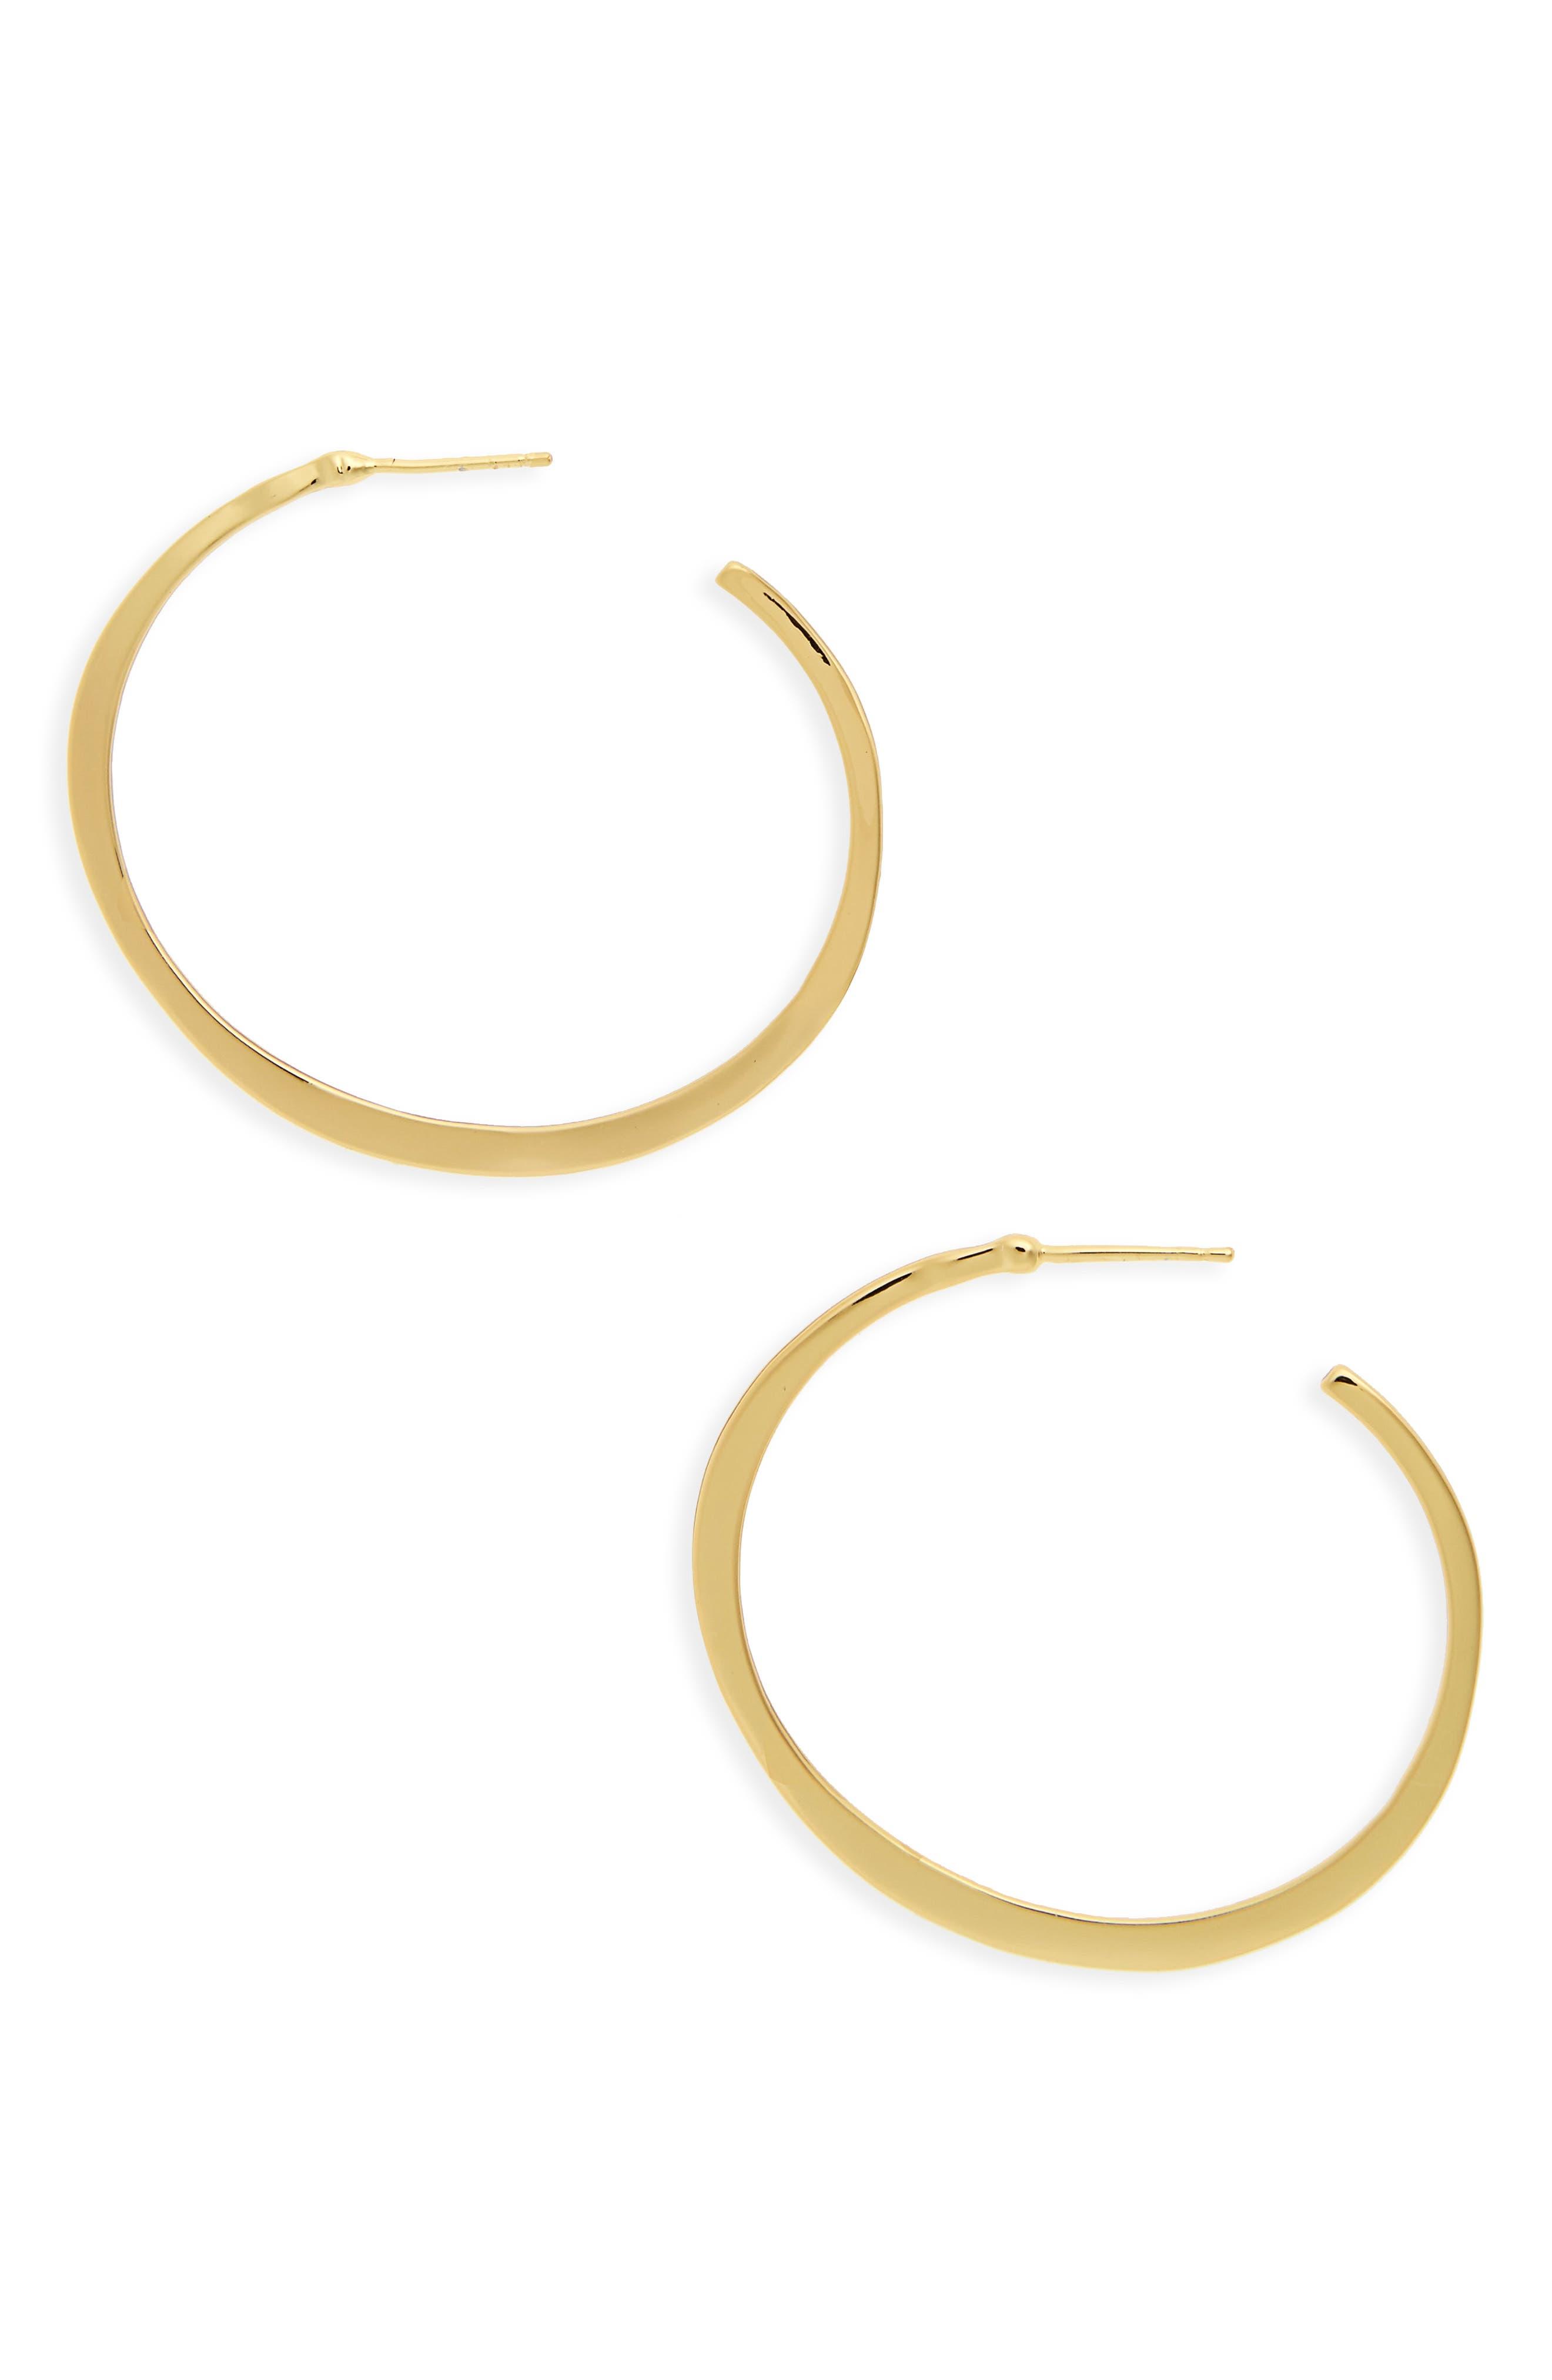 gorjana 'Arc' Hoop Earrings